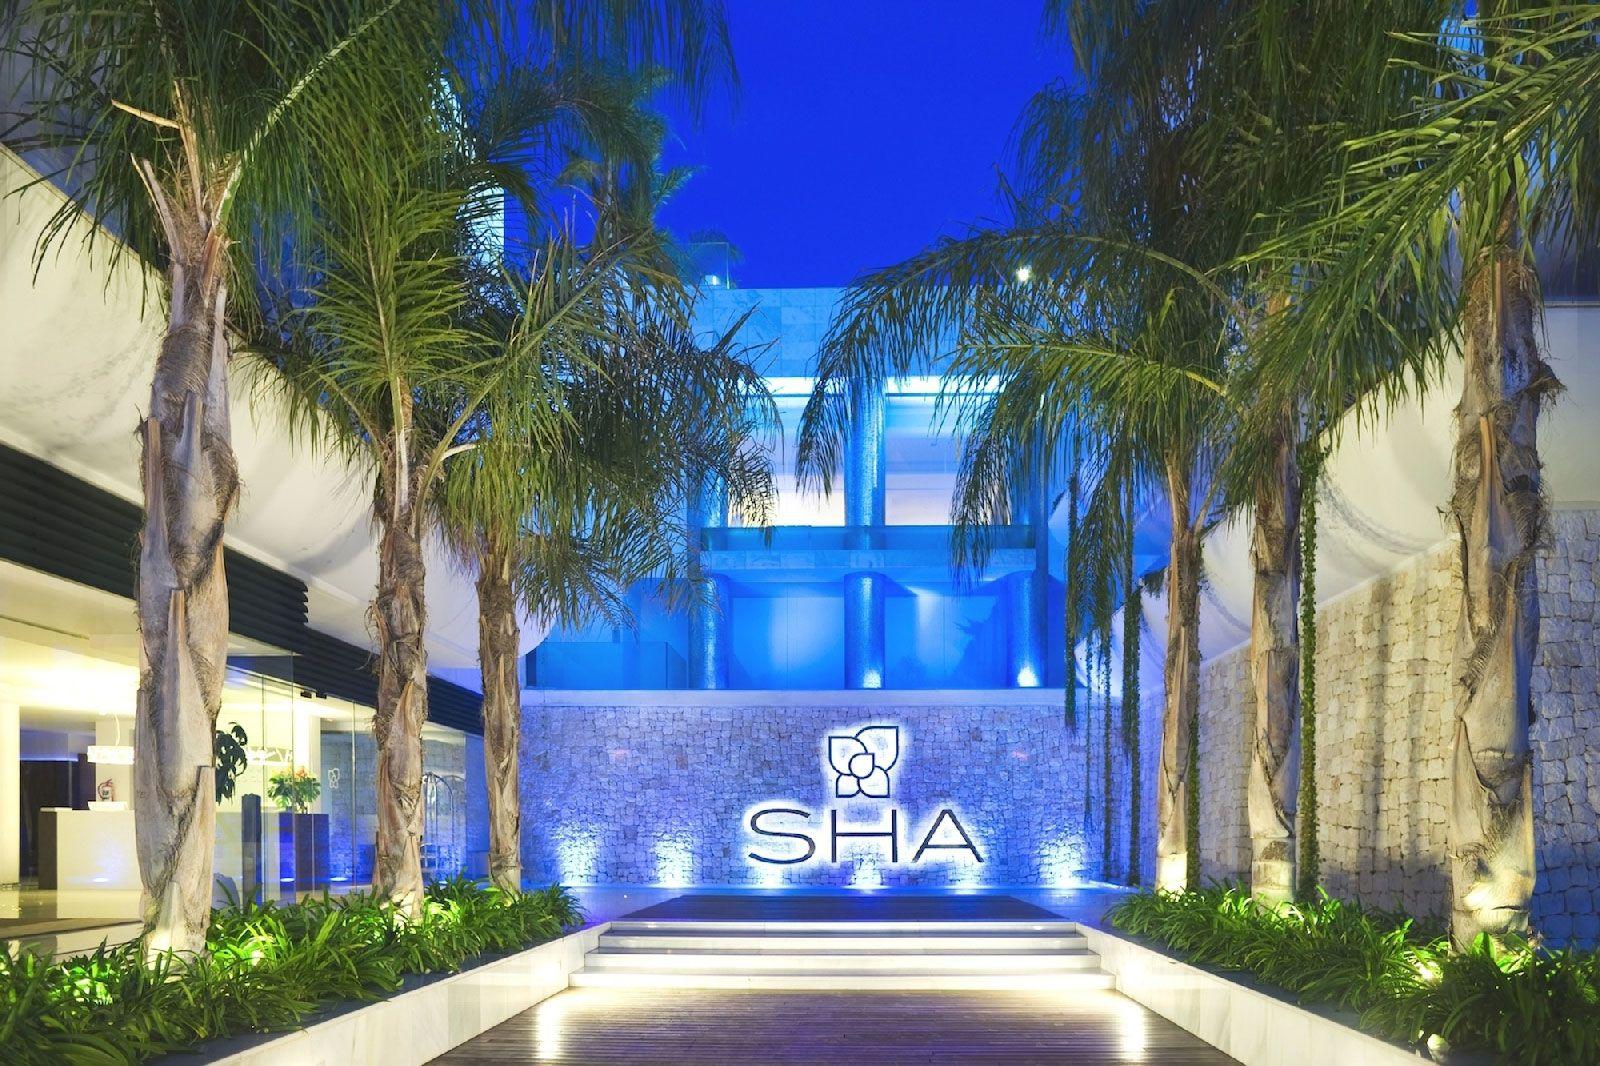 Sha Wellness Clinic Named Best Spa Of Spain 2015 Hoteles Hoteles De Lujo Viajes